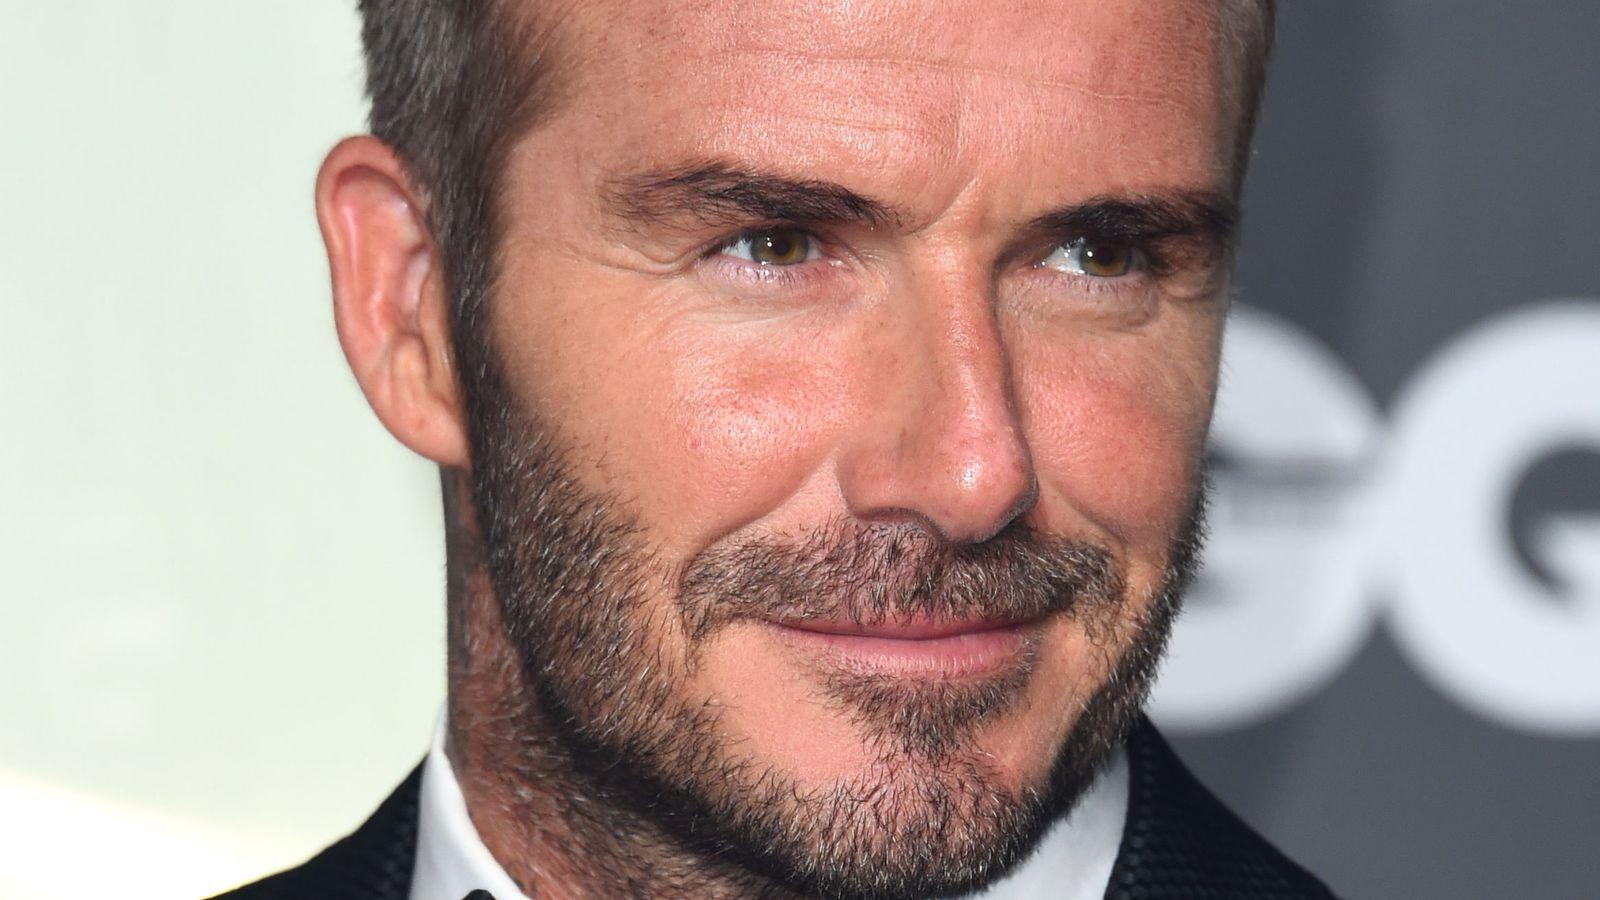 David Beckham backs meals campaign for coronavirus key workers